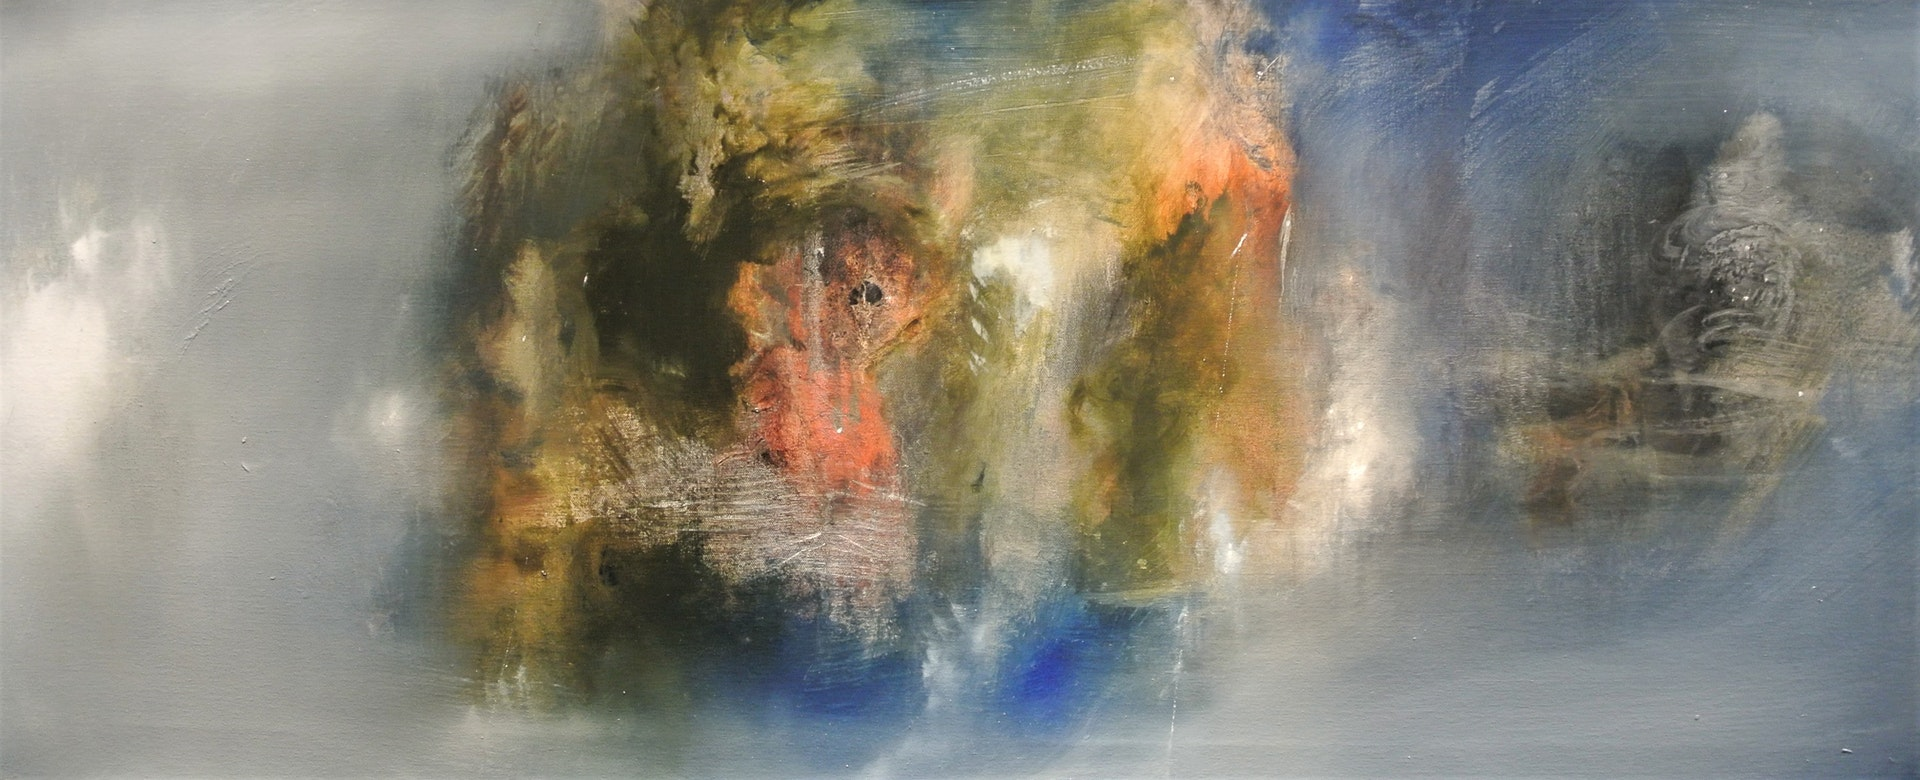 Fernando Velazquez  Ruh Nobati  Oil on canvas, 50 x 120 cm  http://www.fernandovelazquez.co.uk